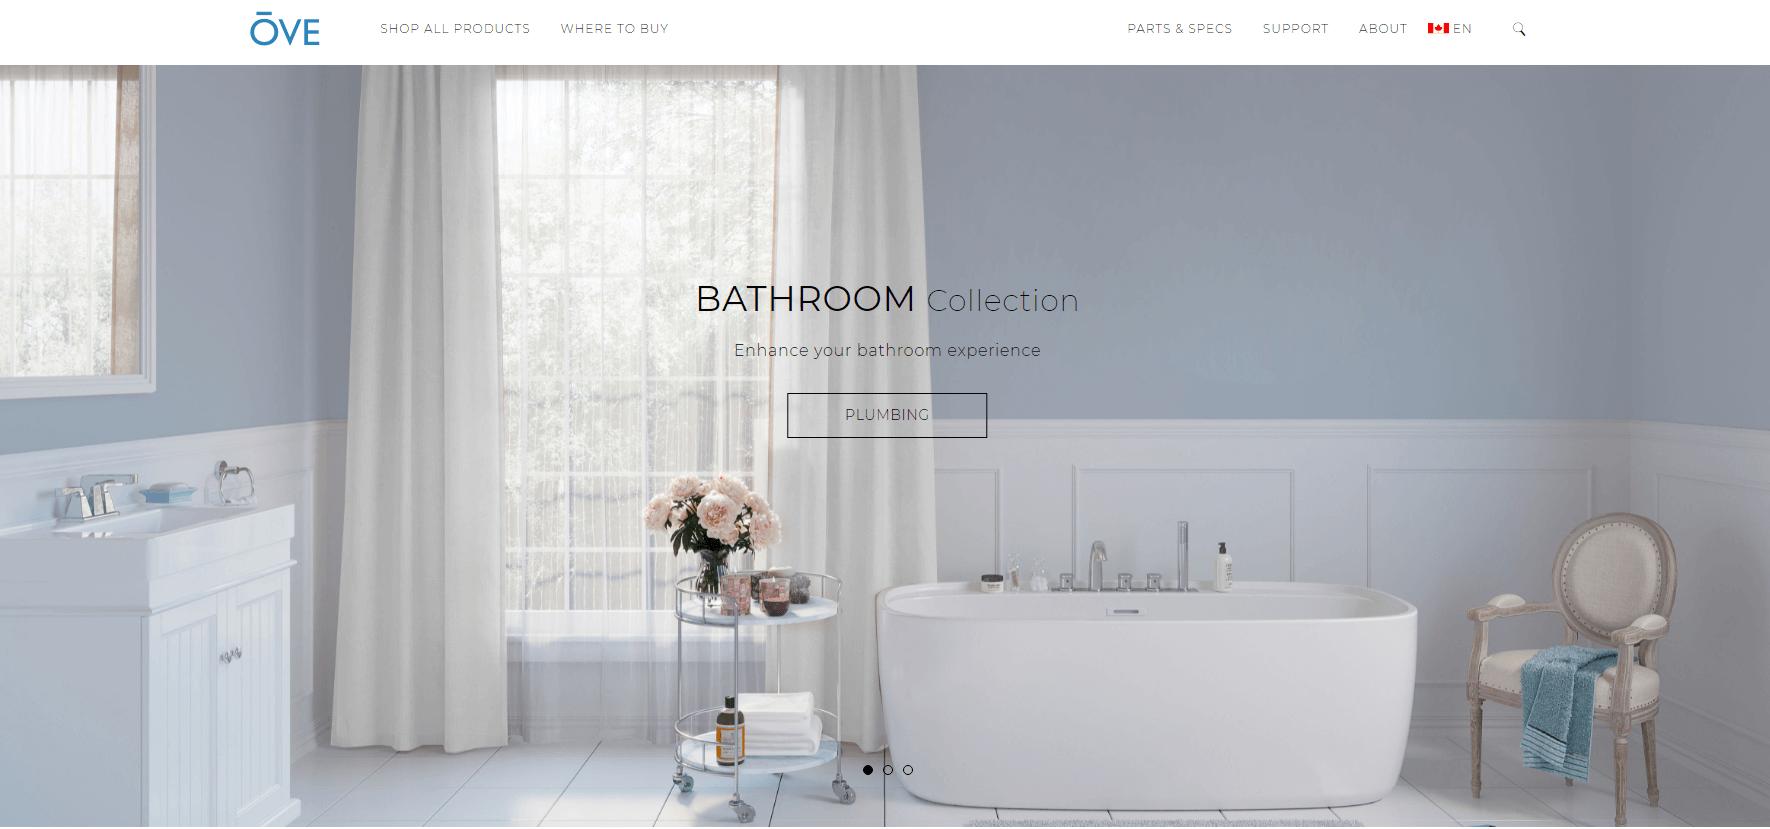 OVE Decore Bathtub Manufacturer